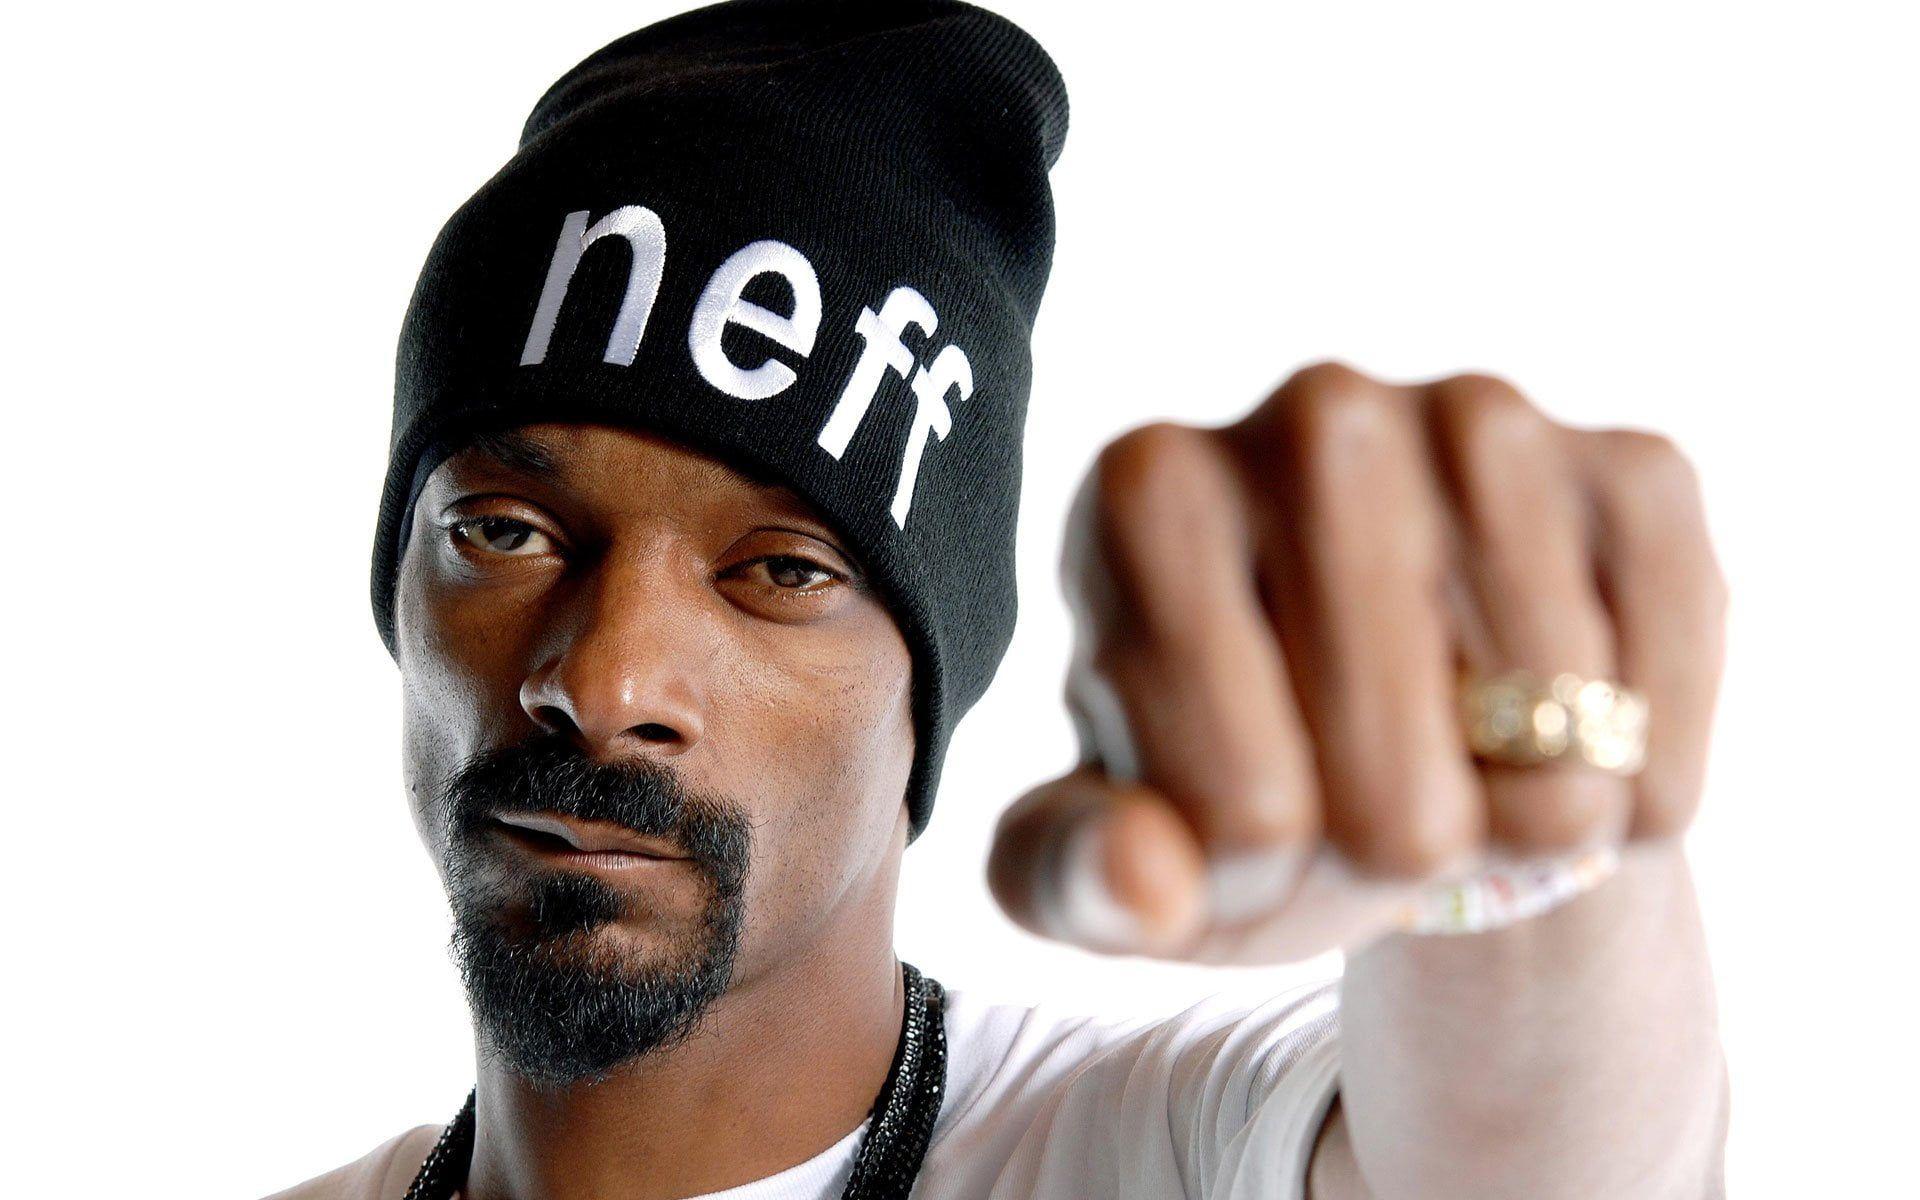 Singers Snoop Dogg 1080p Wallpaper Hdwallpaper Desktop In 2020 Snoop Dogg Snoop Doggy Dogg Dogg